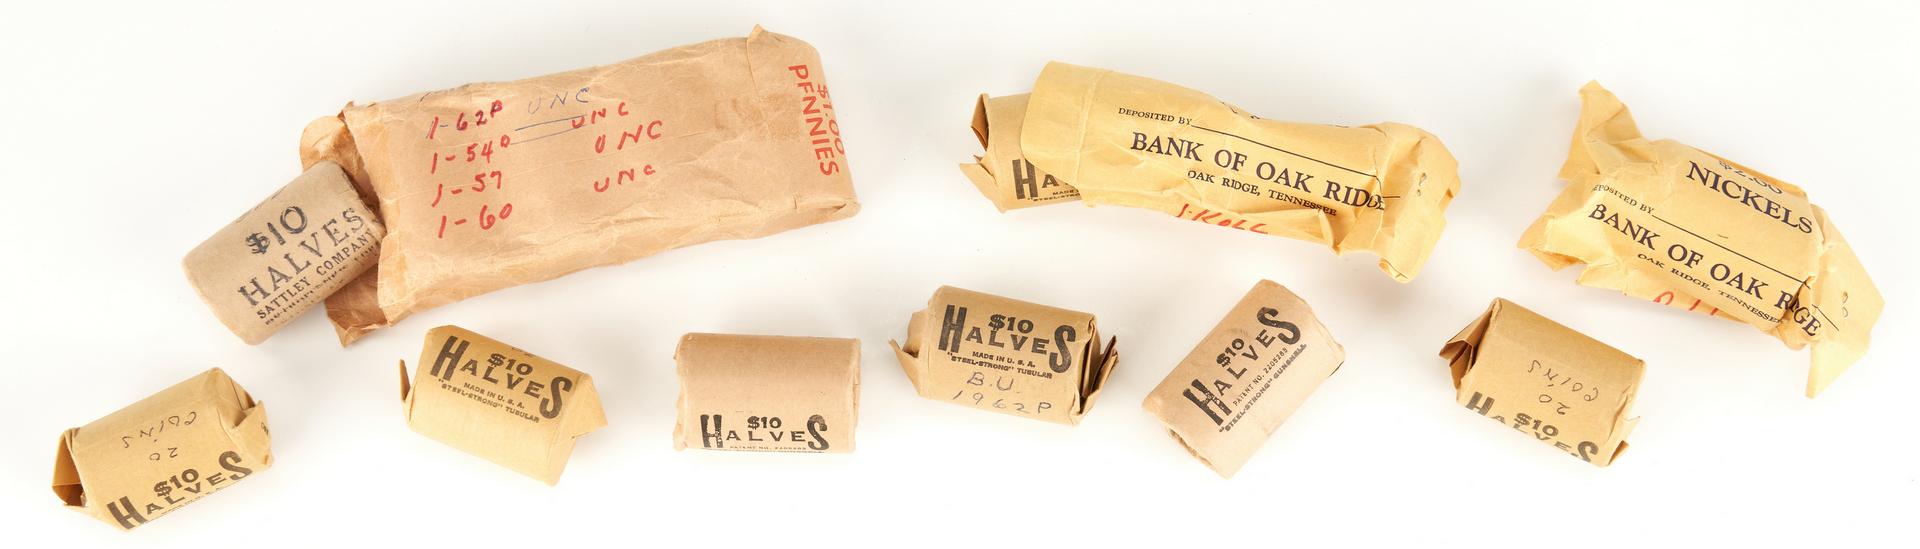 Lot 737: 274 90% Franklin Silver Half Dollars, incl. UNC Rolls